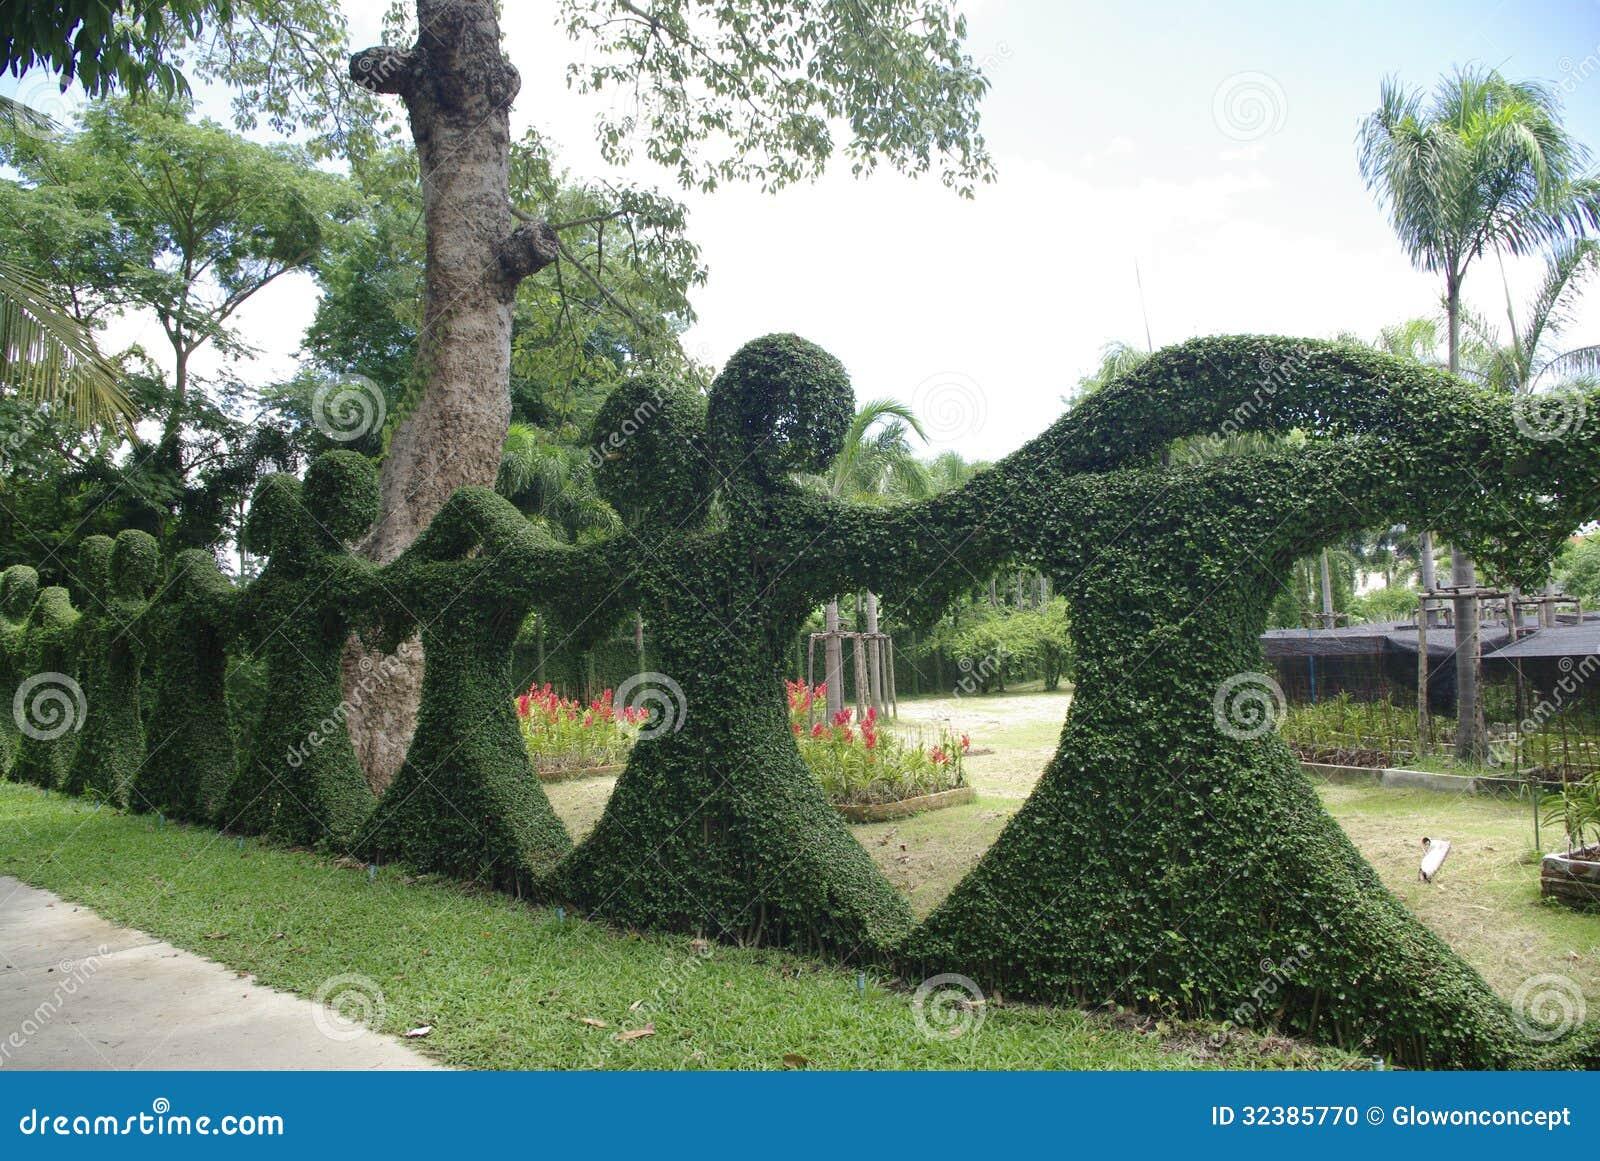 heart bush fence fantasy garden stock photo image 32385770. Black Bedroom Furniture Sets. Home Design Ideas